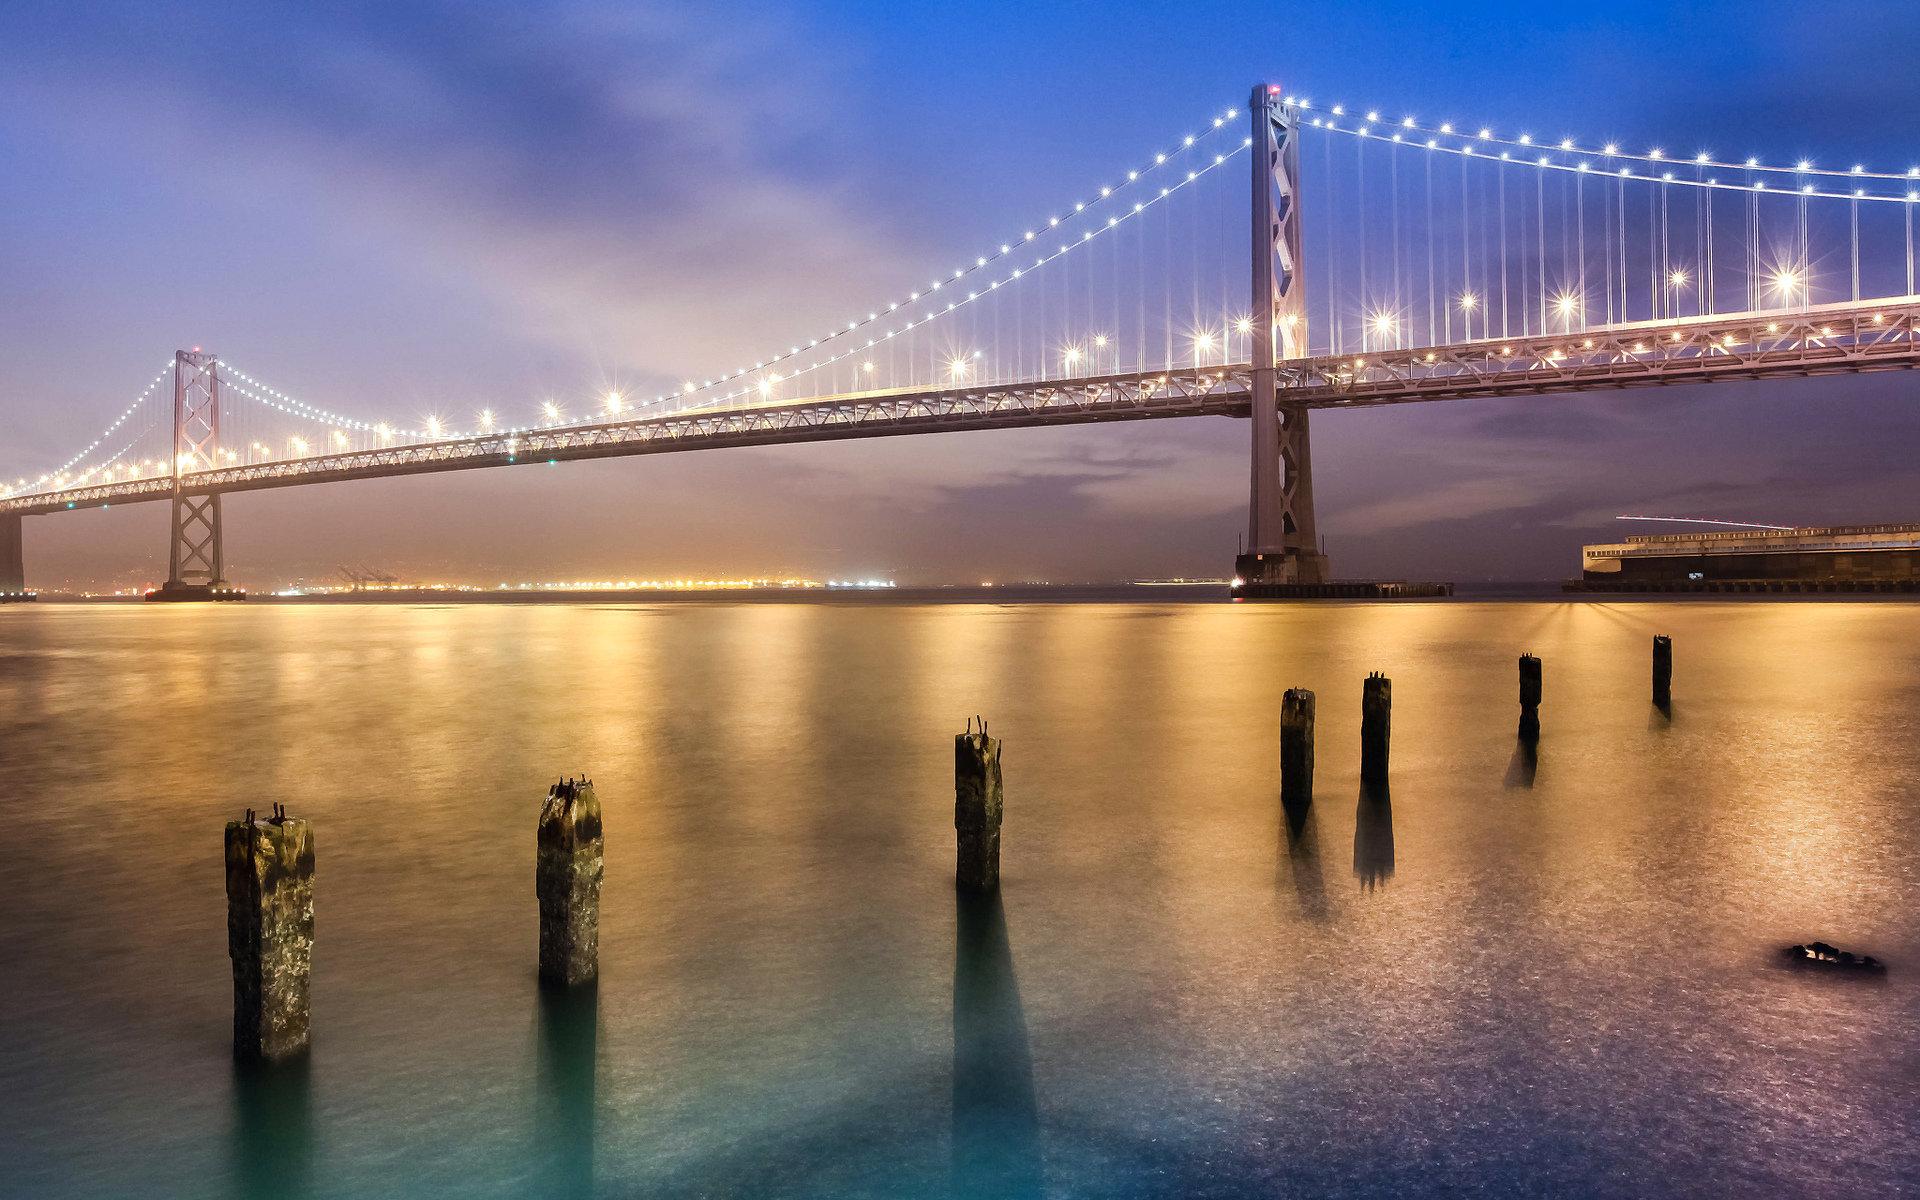 Evening Crossing, Bay Bridge, San Francisco, California  № 3721005  скачать